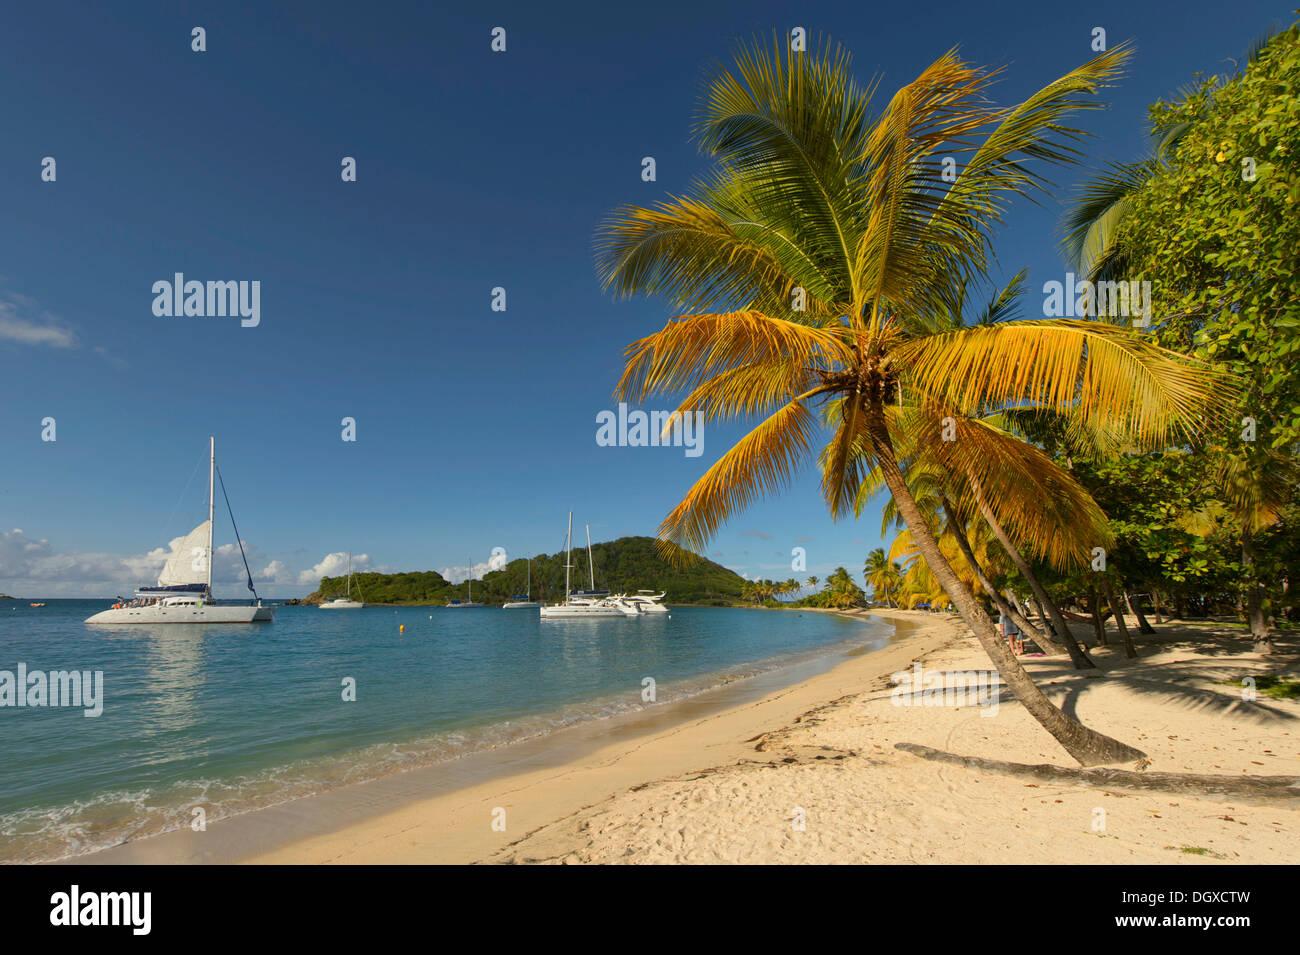 Caribbean Bay mit Palmen Bäume und Boote, Grenadinen, Karibik, Saint Lucia Stockbild